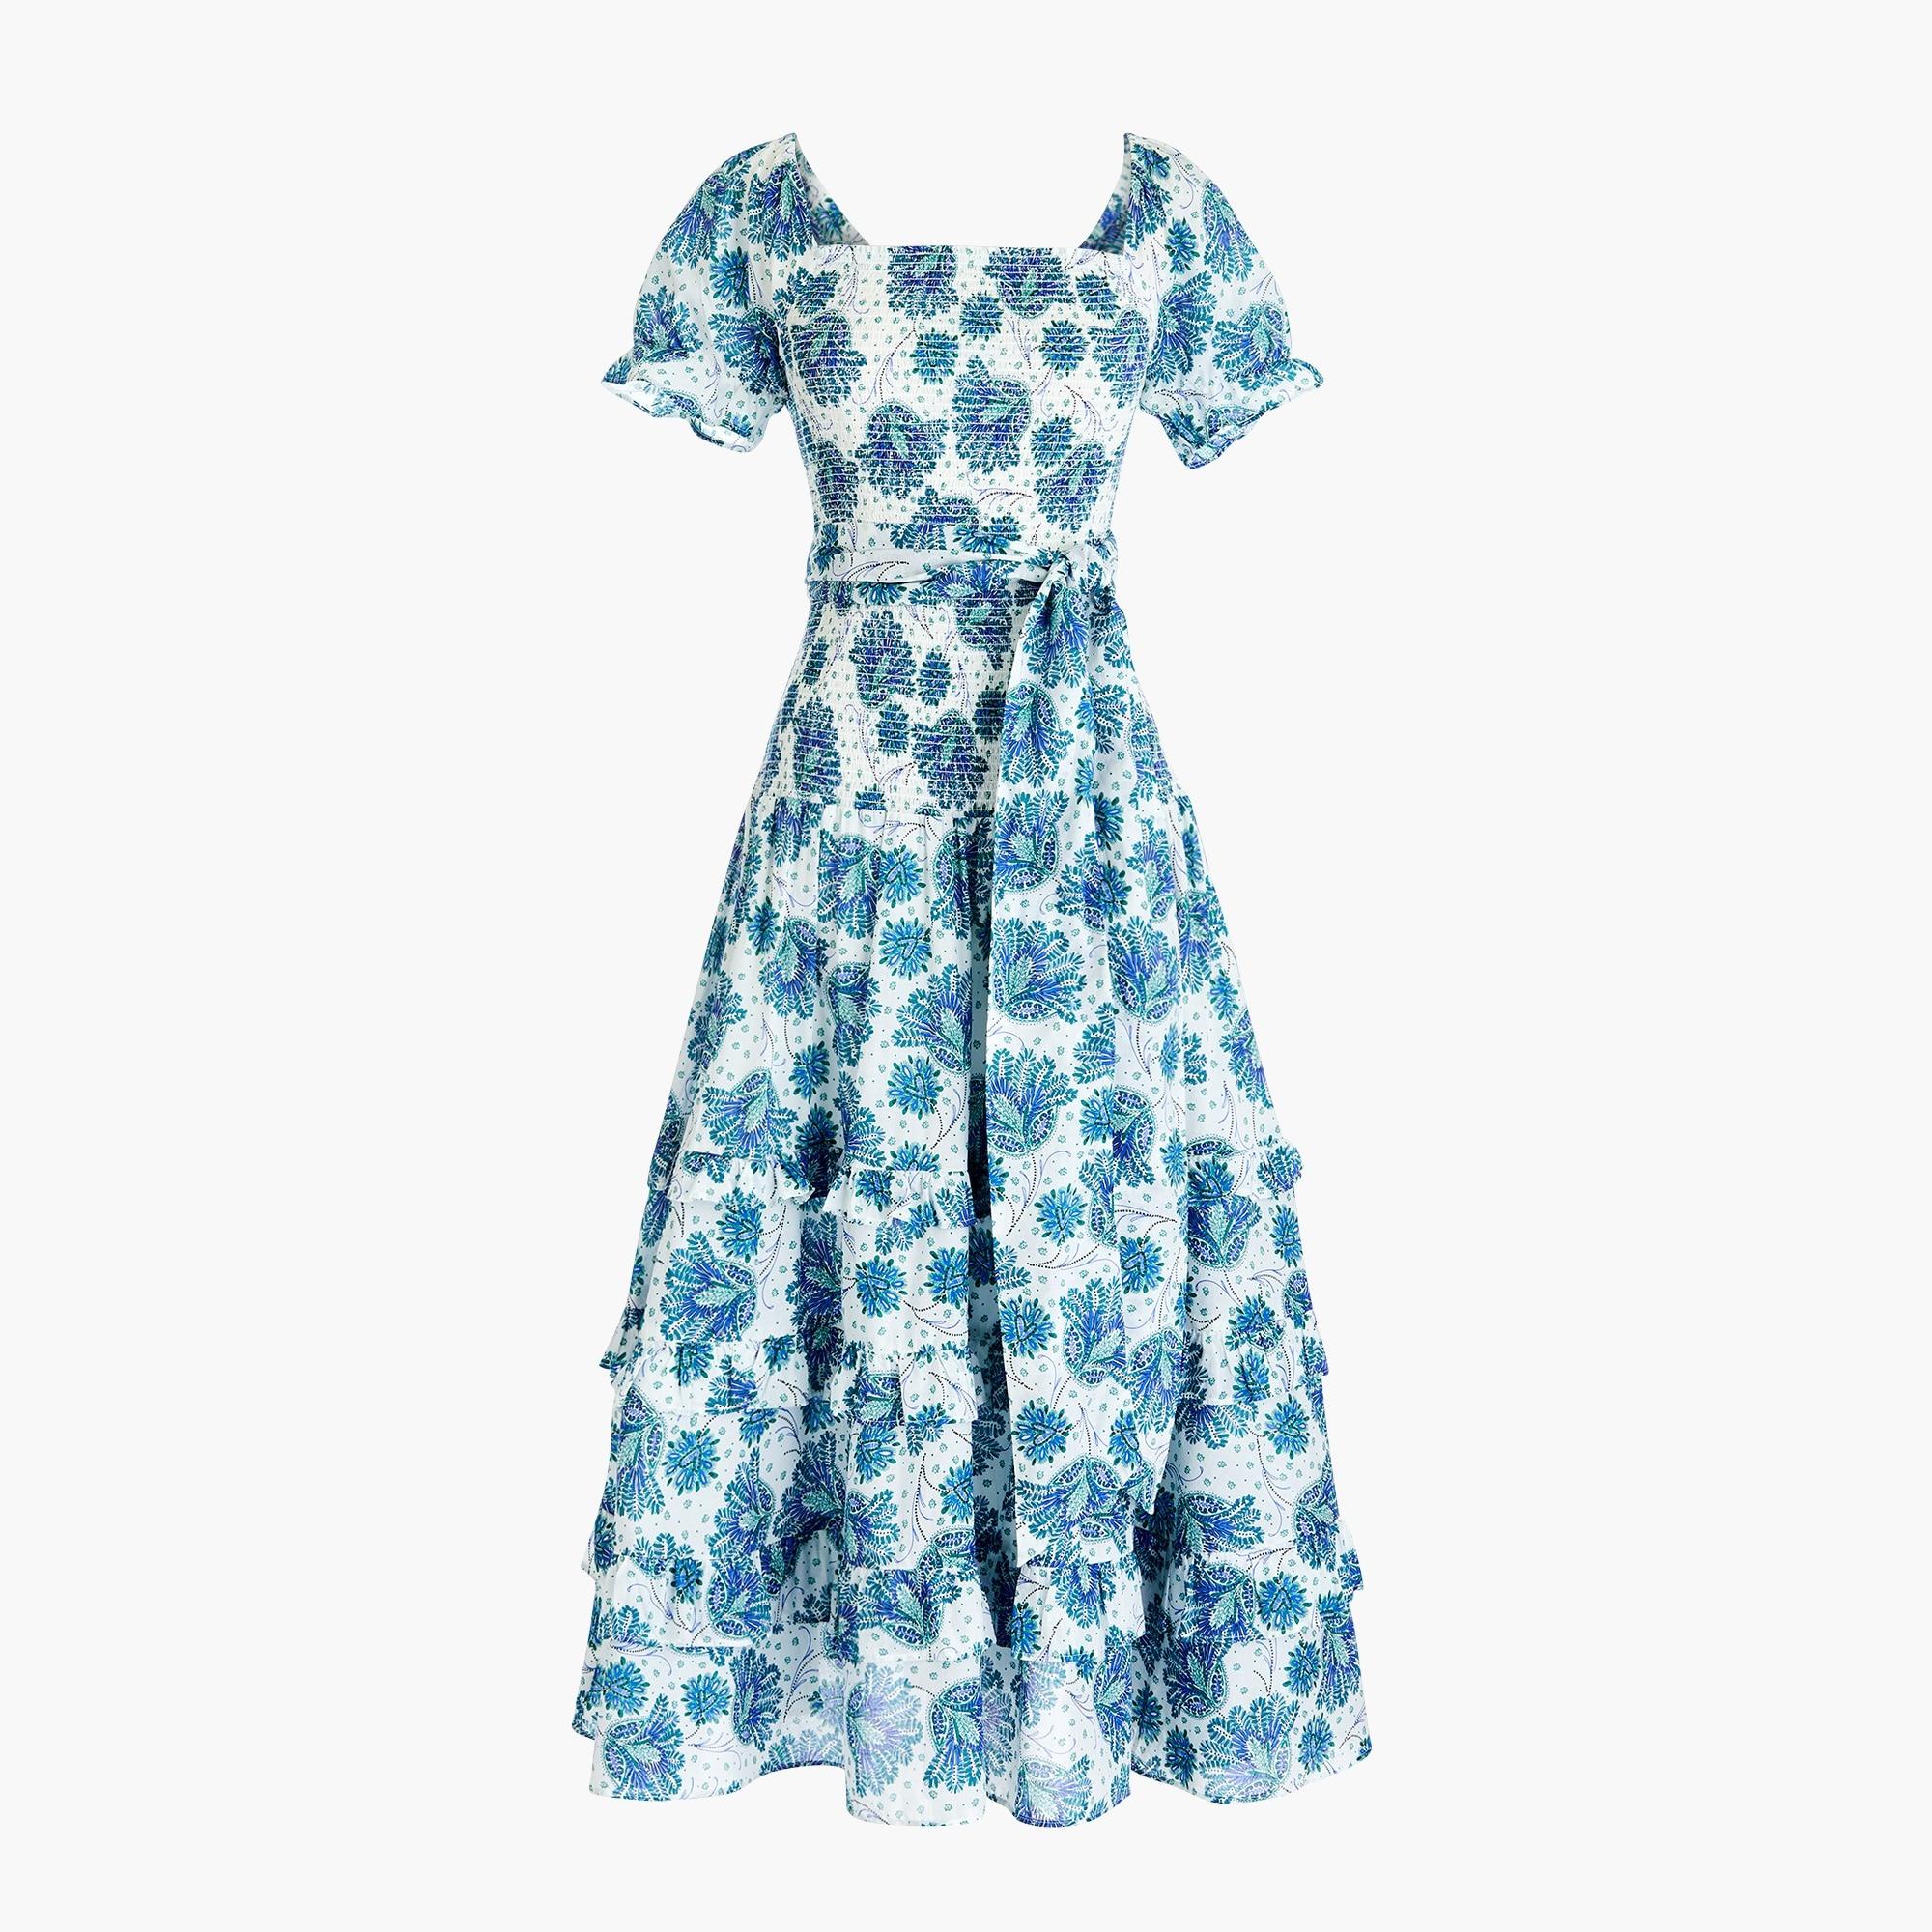 Smocked prairie midi dress in floral cotton voile